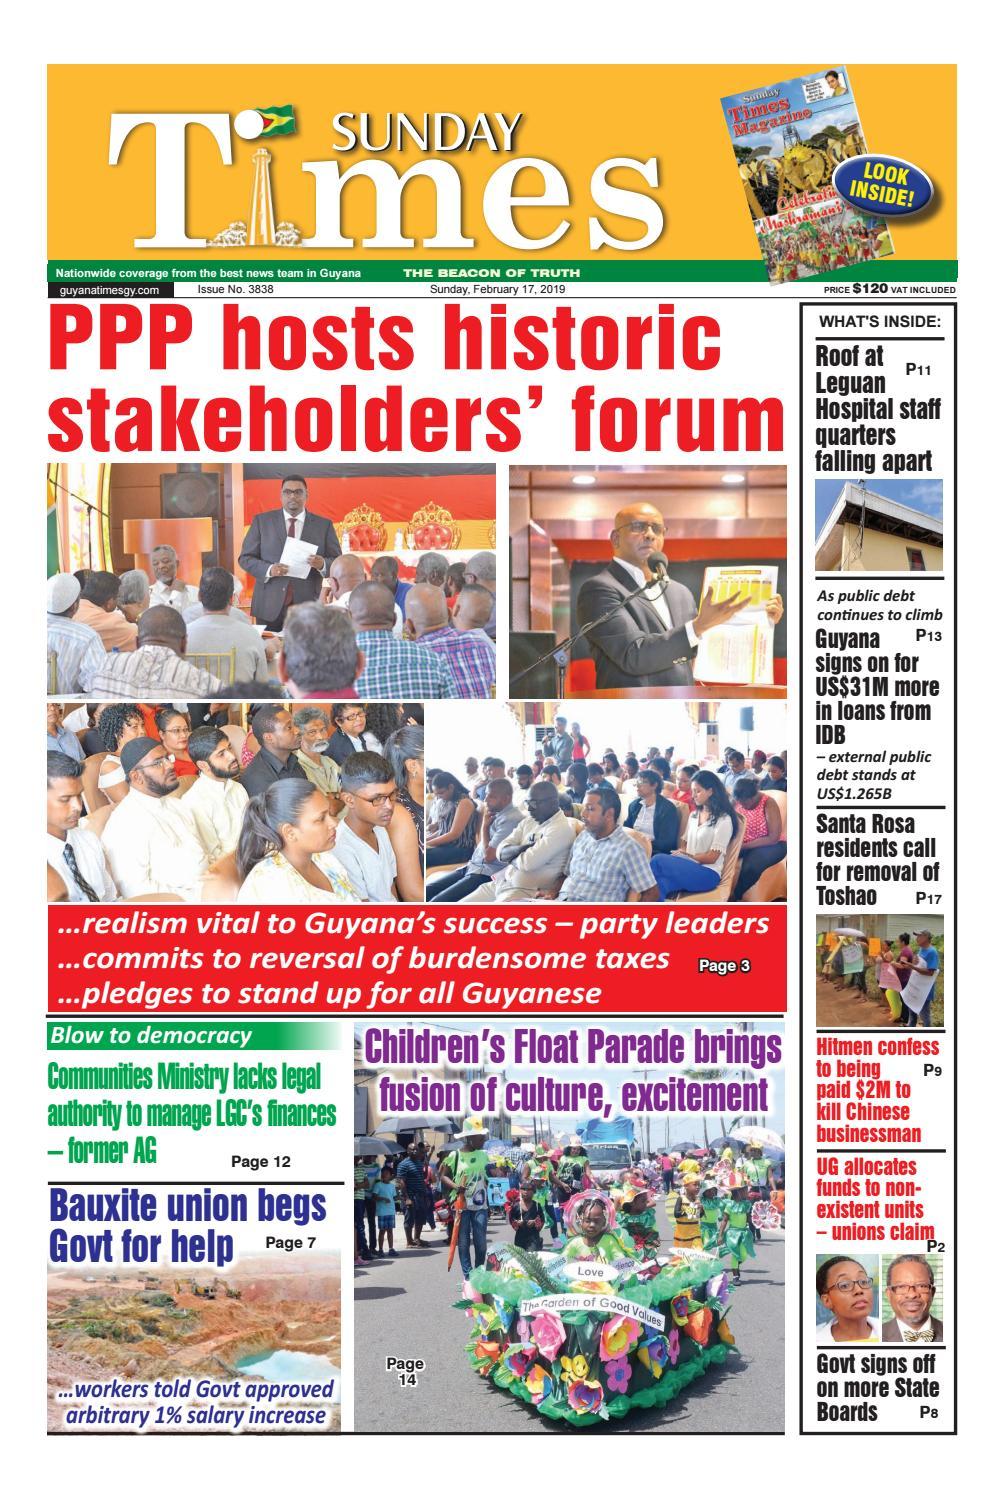 Guyana Times - Sunday, February 17, 2019 by Gytimes - issuu